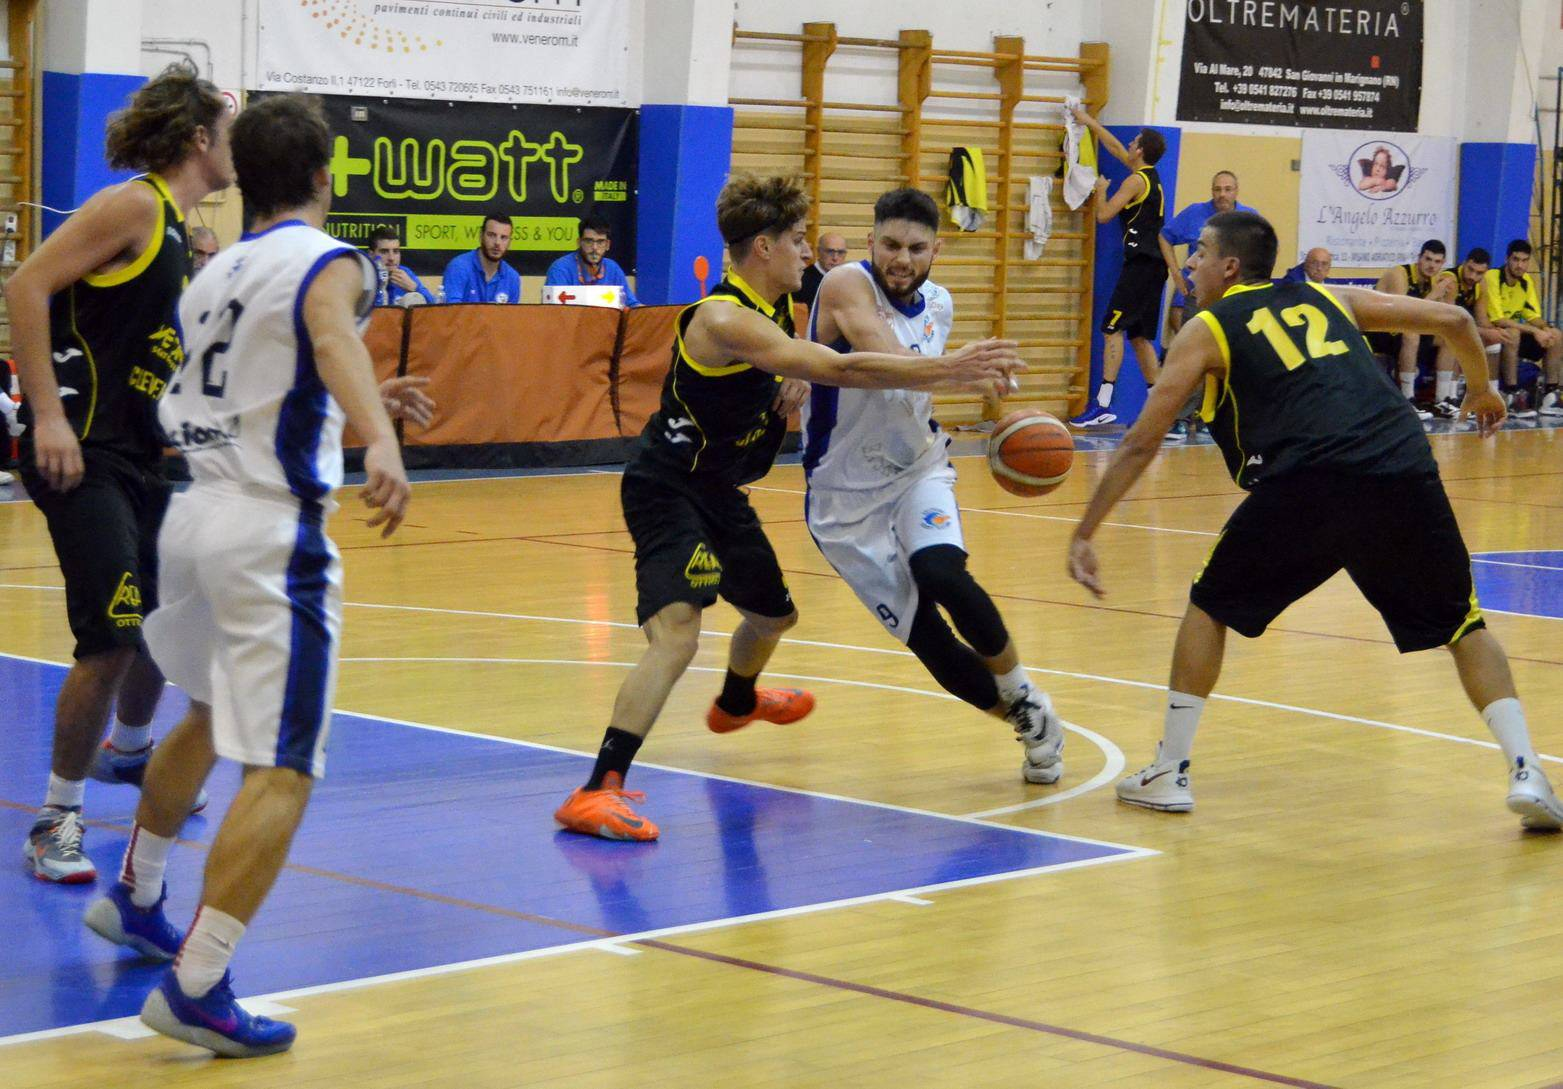 Dany Dolphins Riccione-Scuola Basket Cavriago 77-70 dts